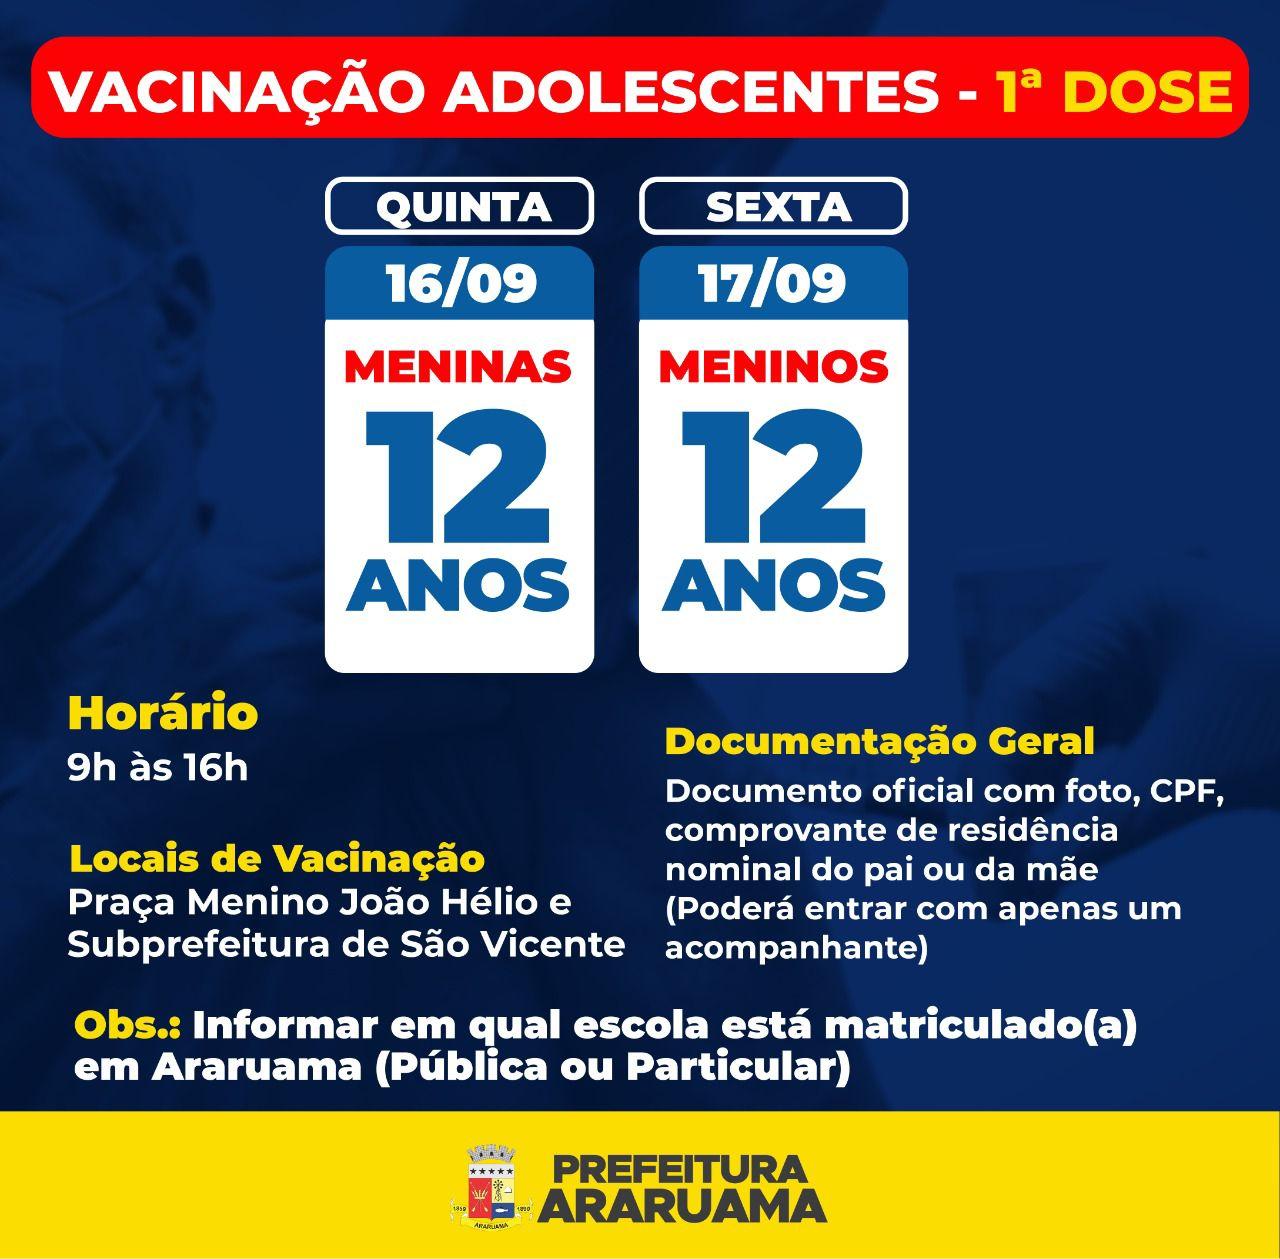 Prefeitura de Araruama vai vacinar adolescentes de 12 anos contra a COVID-19